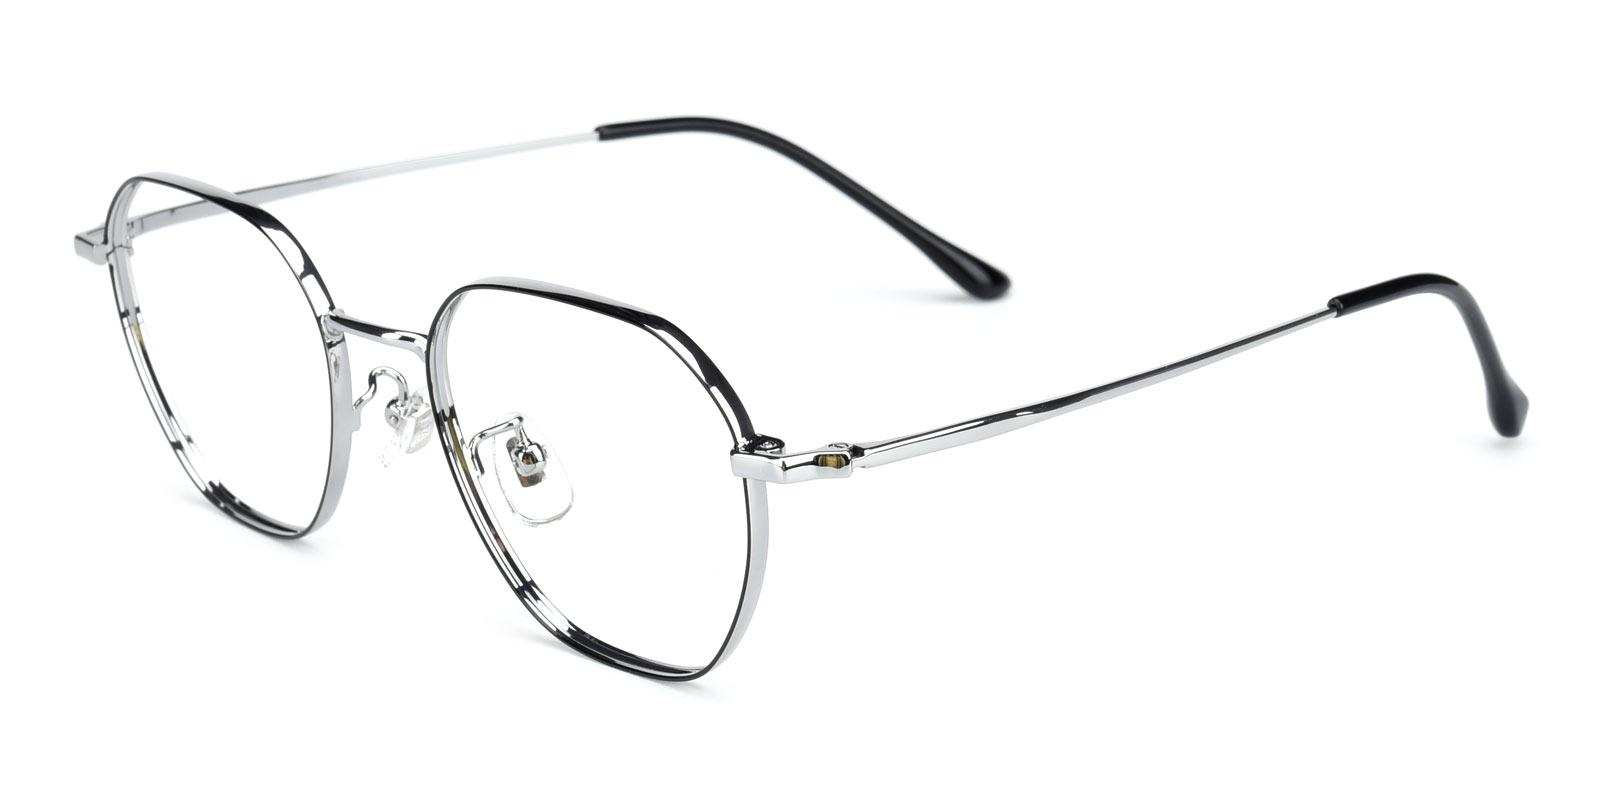 Kyle-Silver-Geometric-Titanium-Eyeglasses-detail